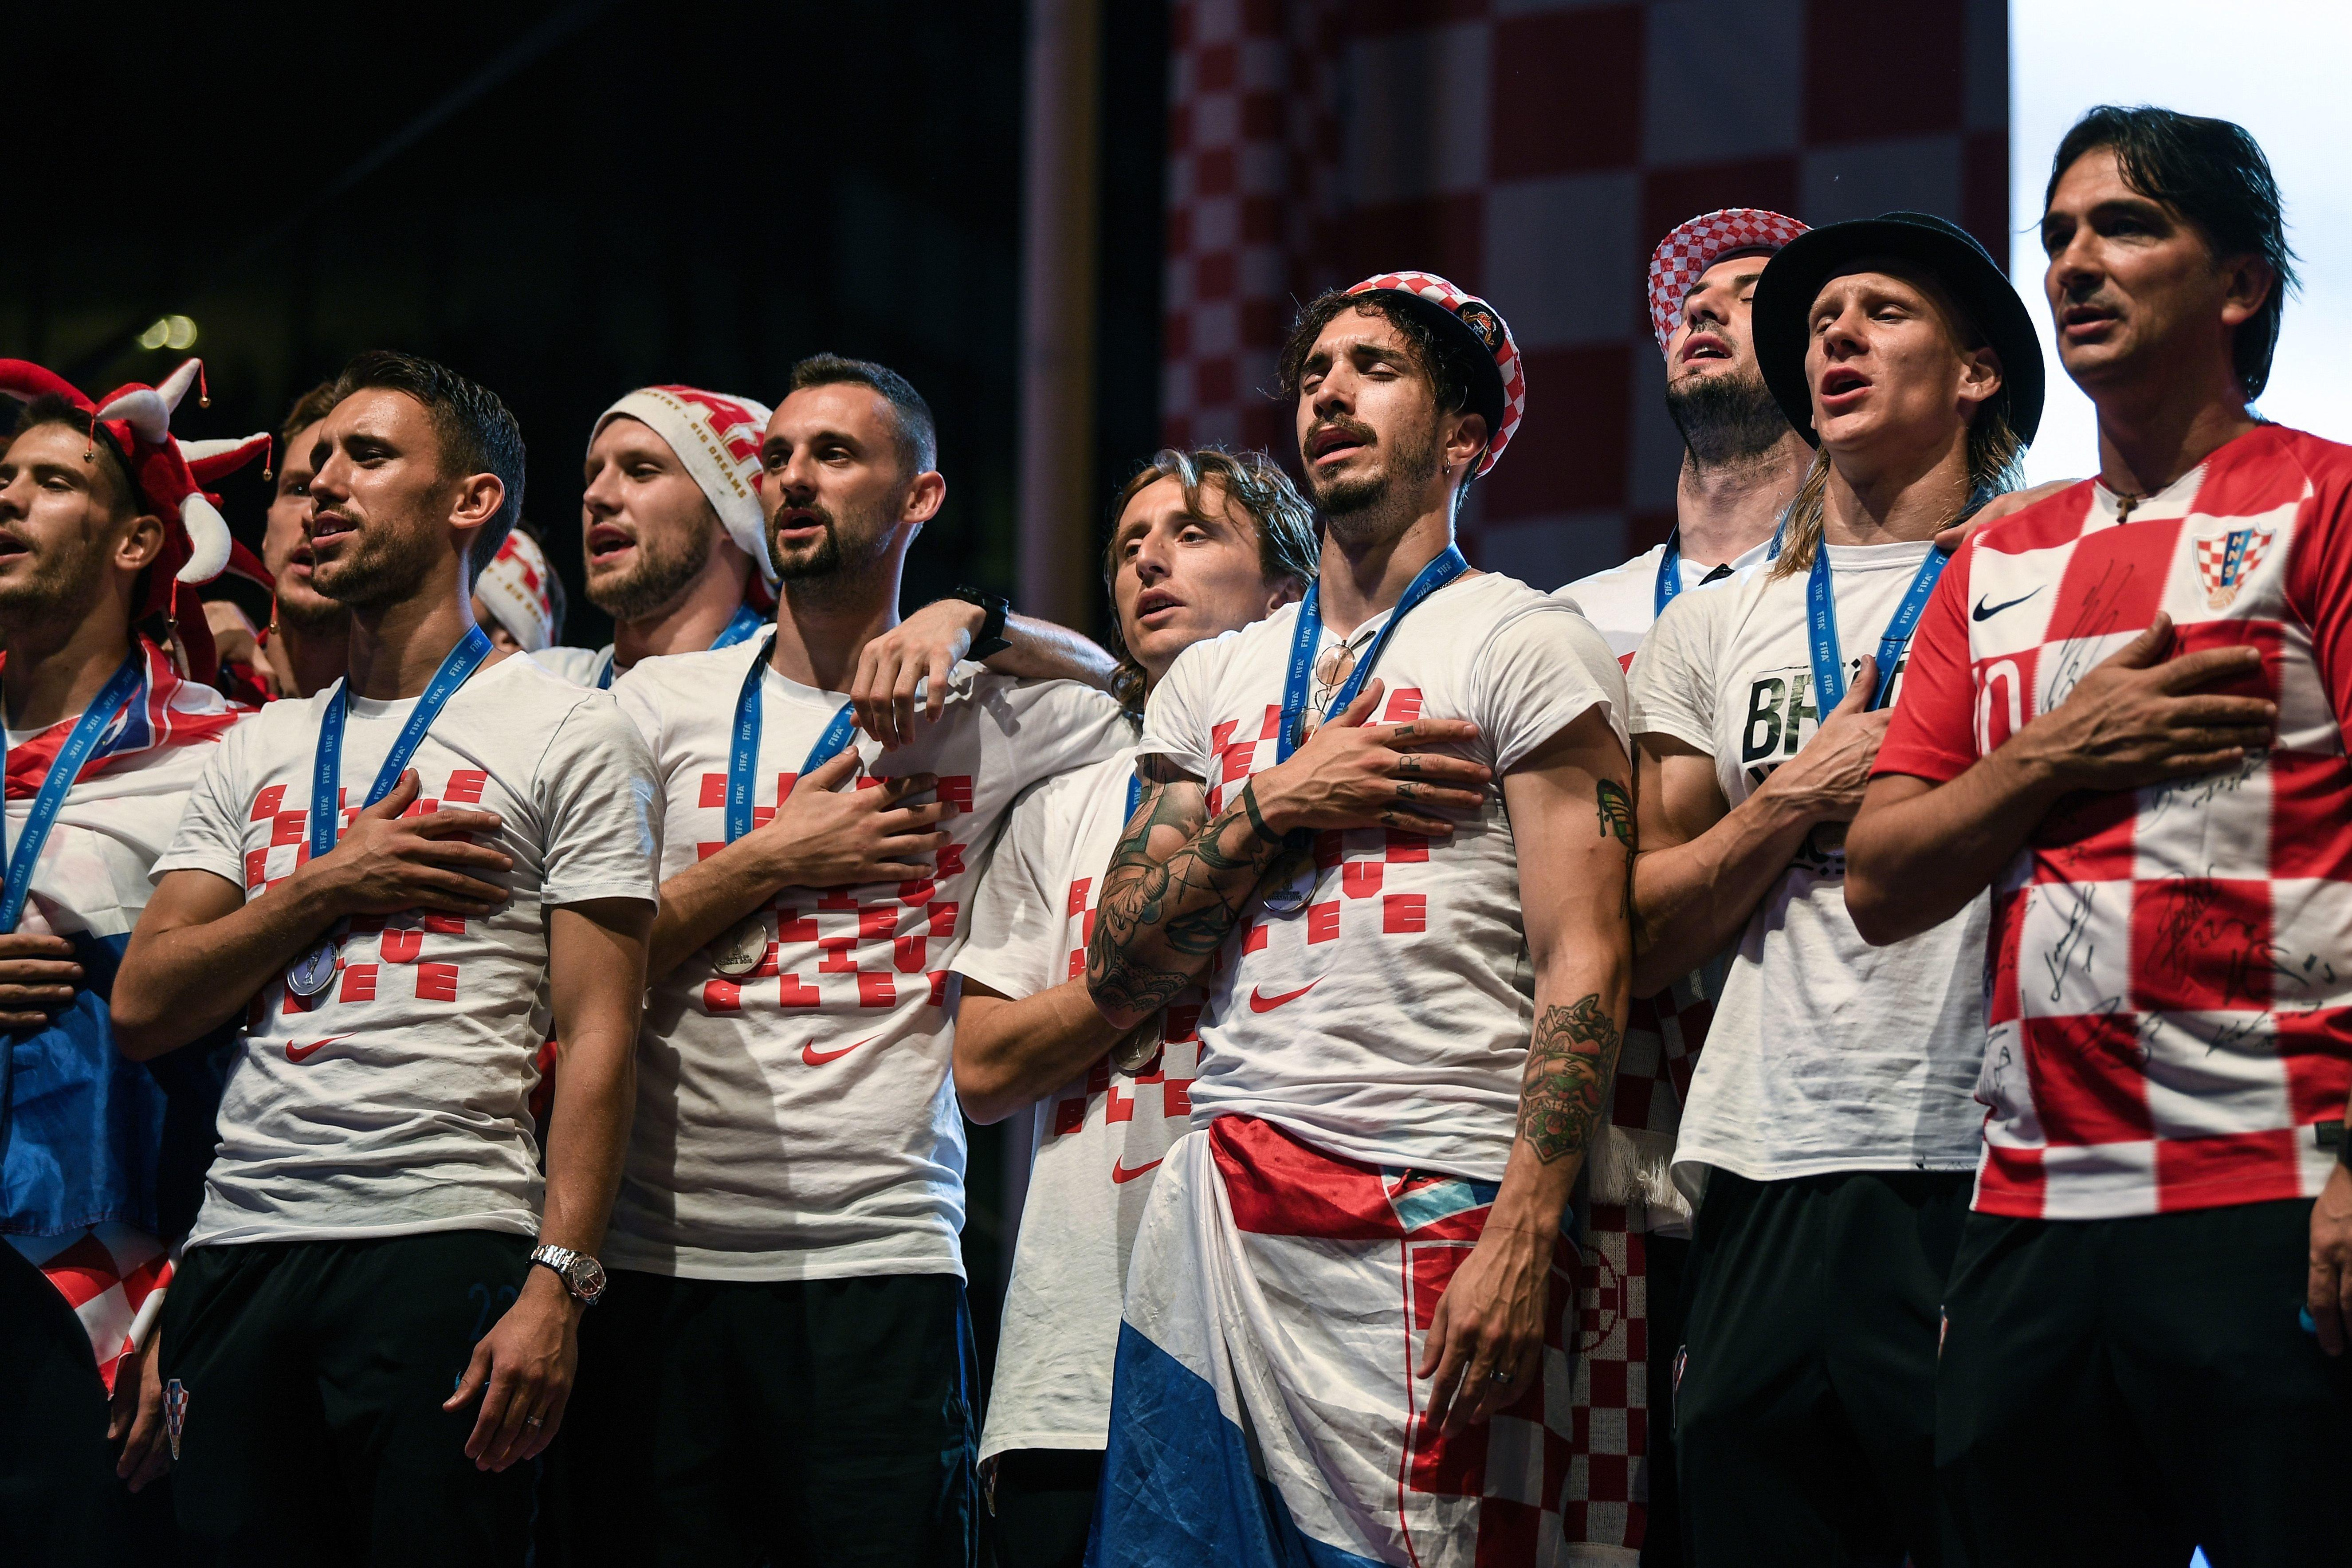 Eklat bei WM-Feier: Kroatiens Nationalteam feiert mit